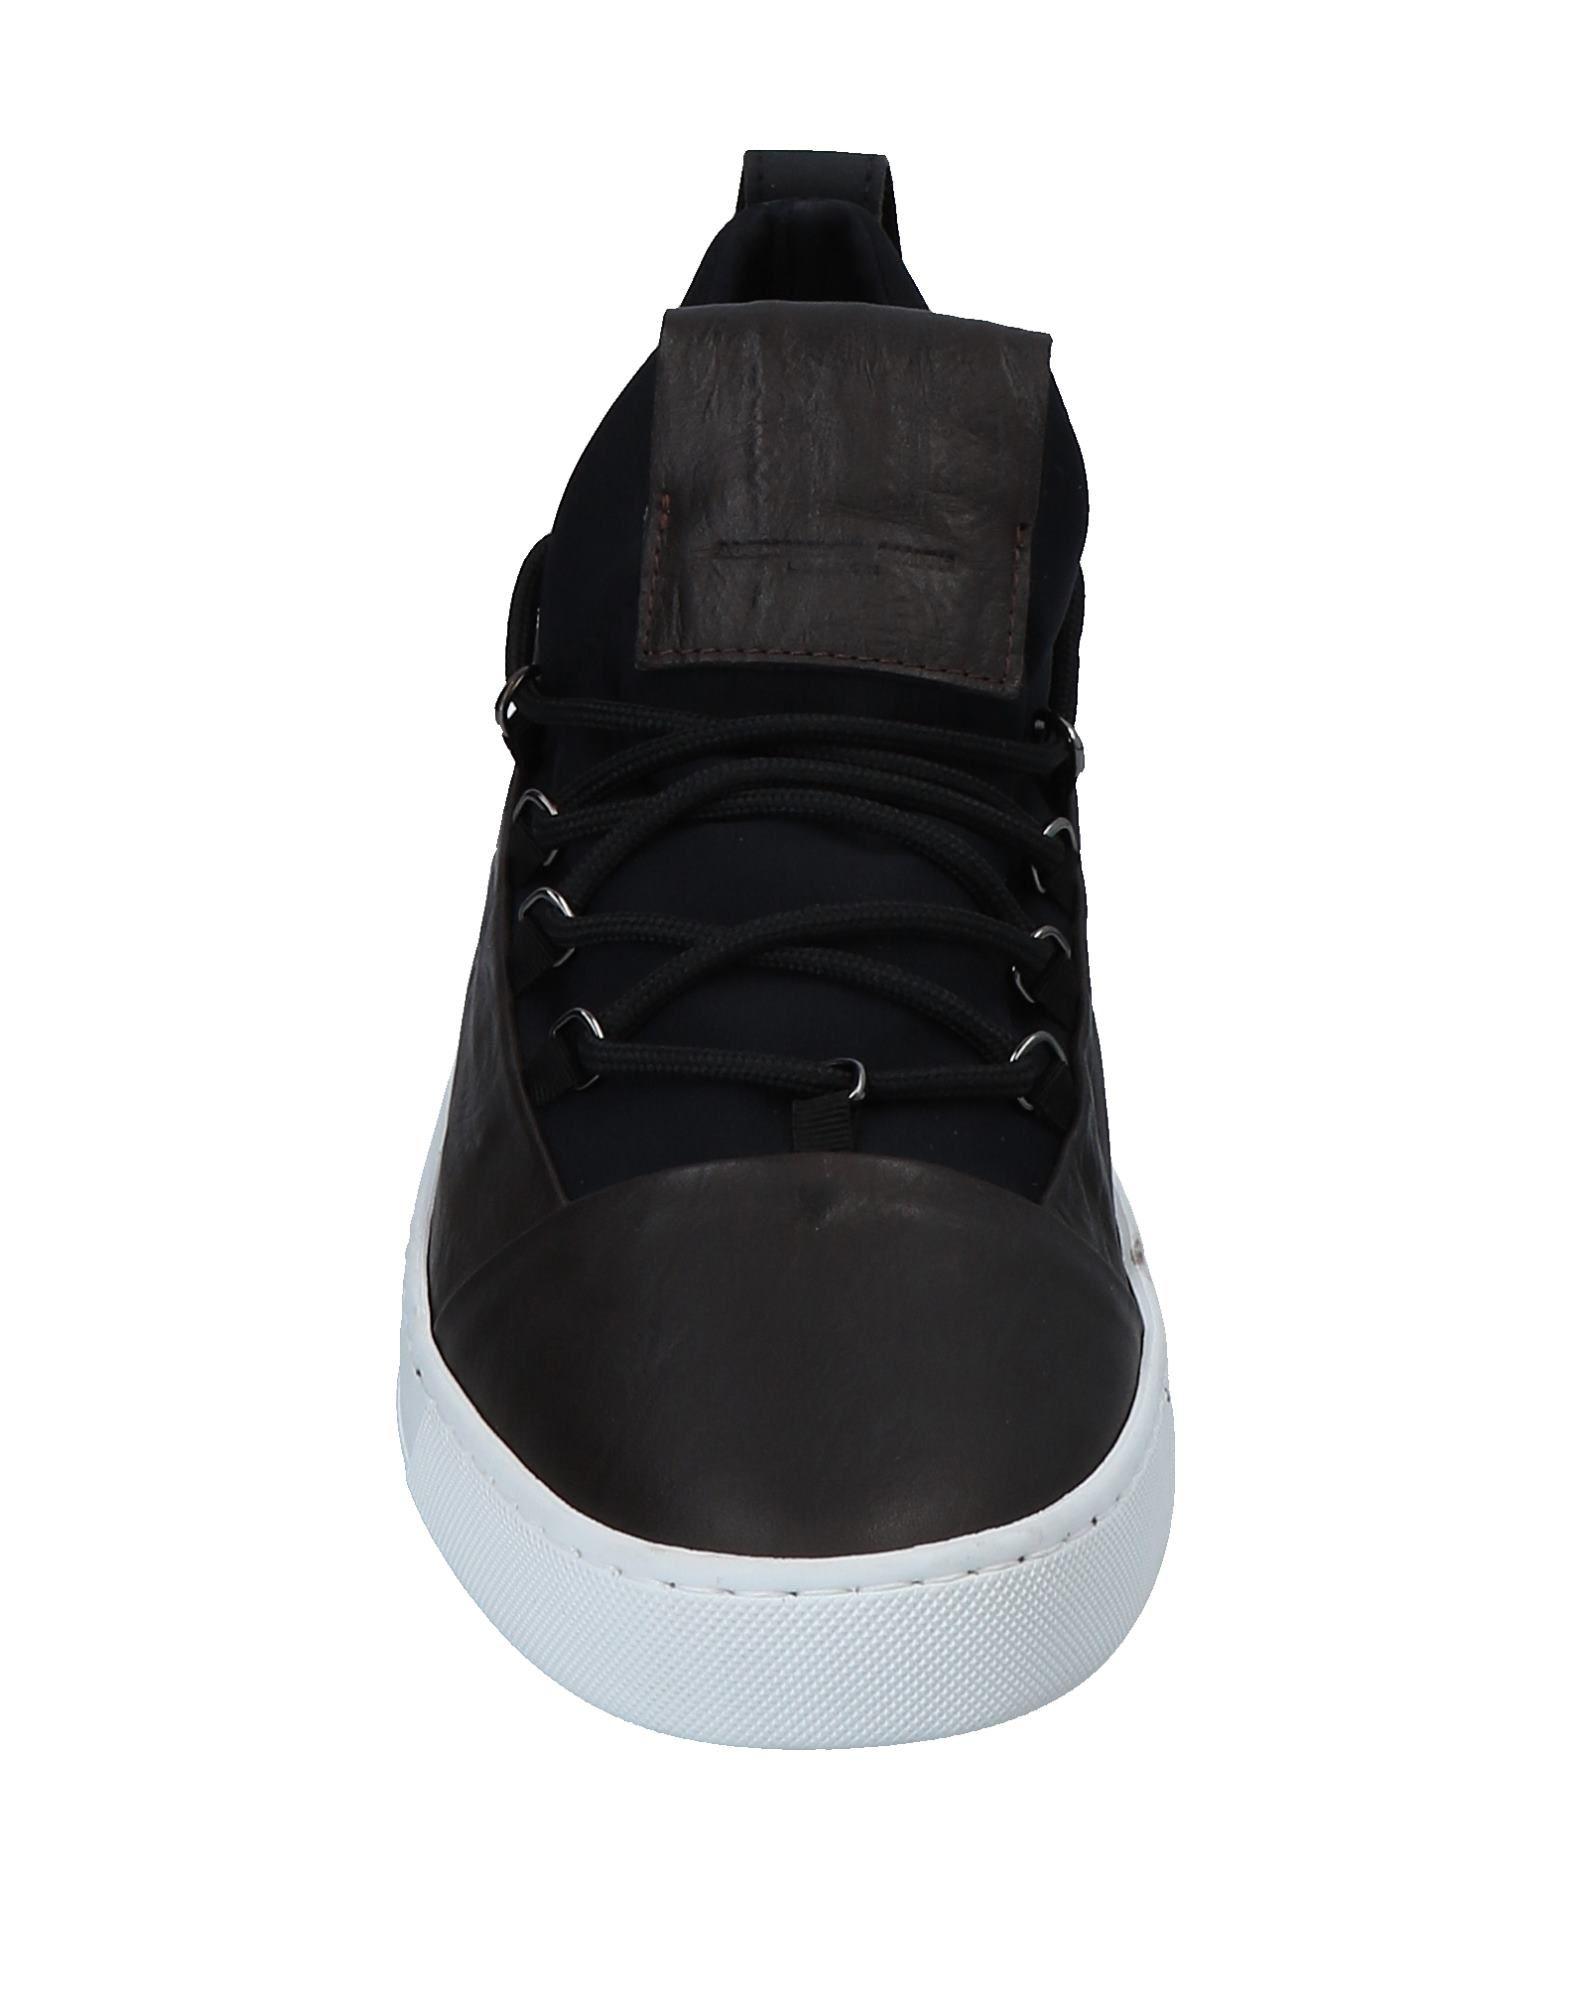 Alexander Smith Sneakers Sneakers Sneakers - Men Alexander Smith Sneakers online on  Canada - 11554228EU e0b8e4